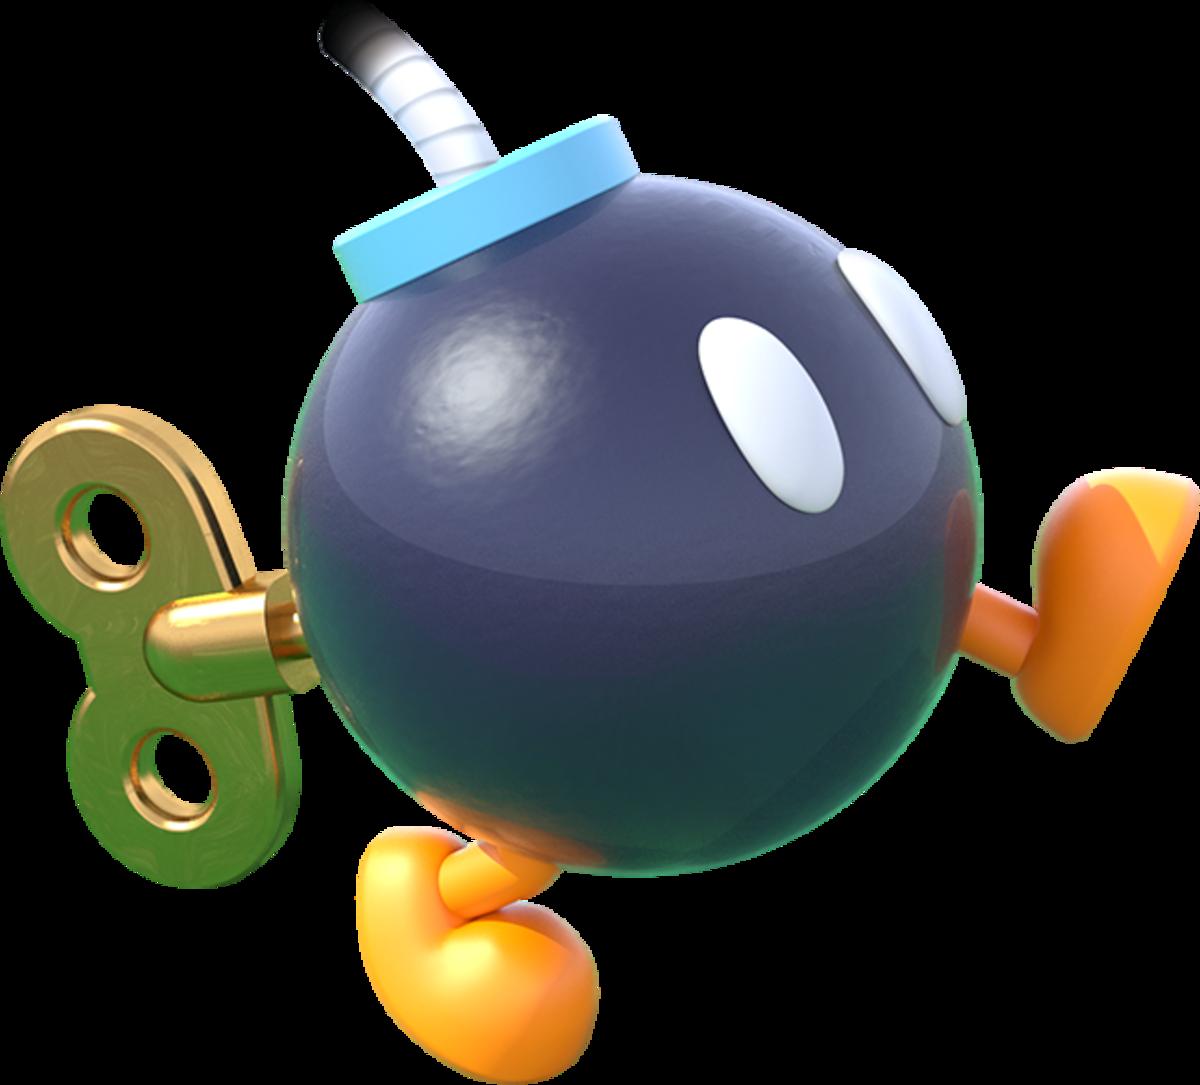 super-mario-bros-2-enemies-used-in-later-games